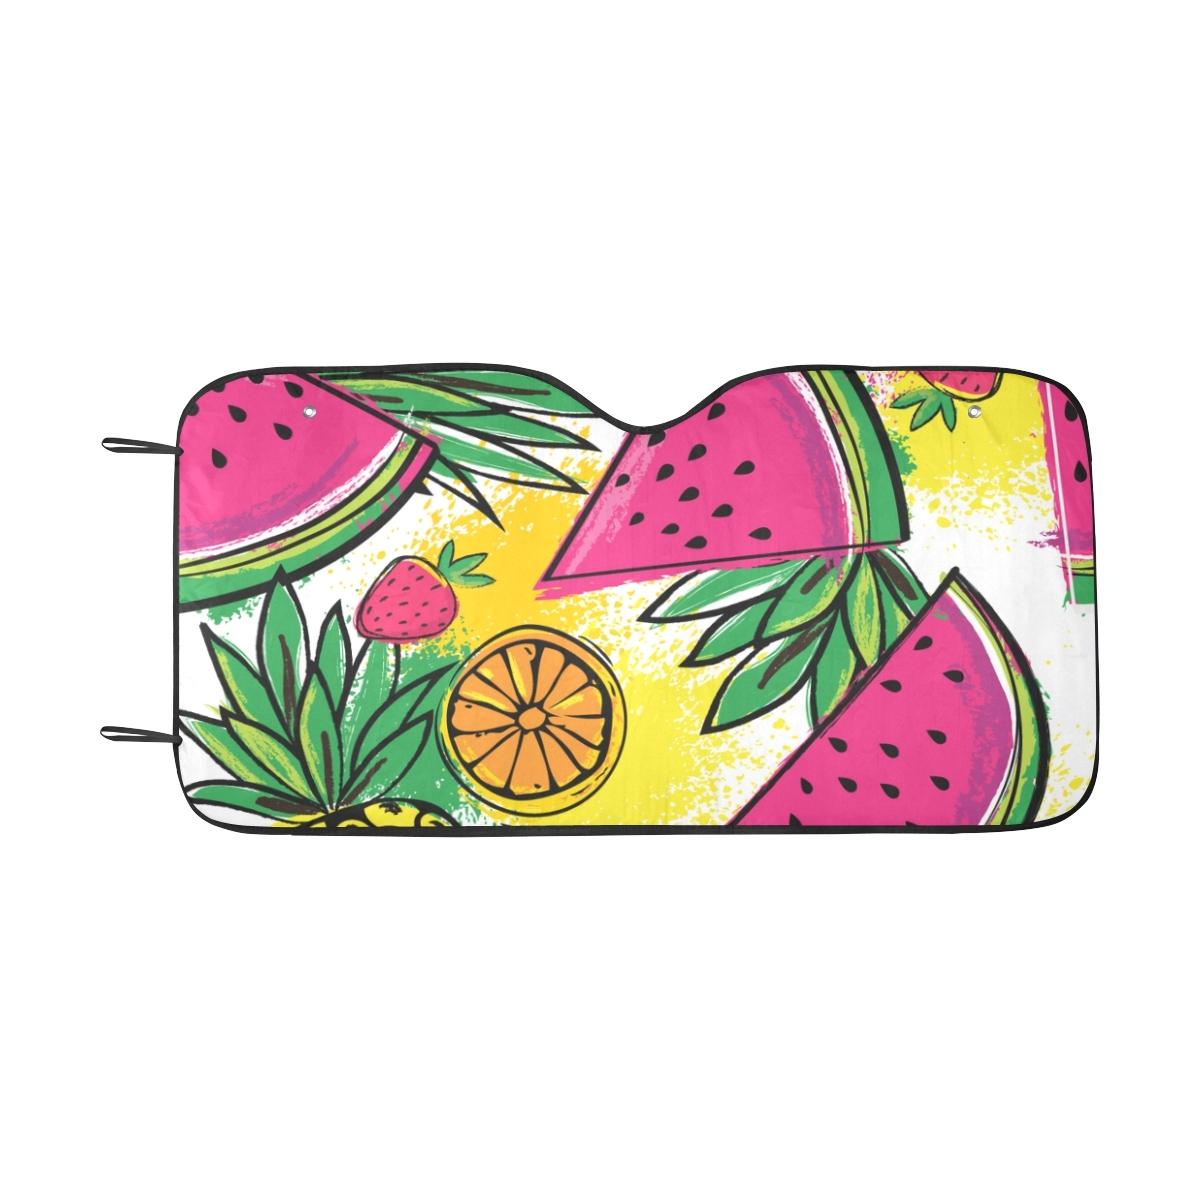 Painting Walls In Shades Of Melon: Car Sun Windshield Shade Fashion Summer Fruit Watermelon